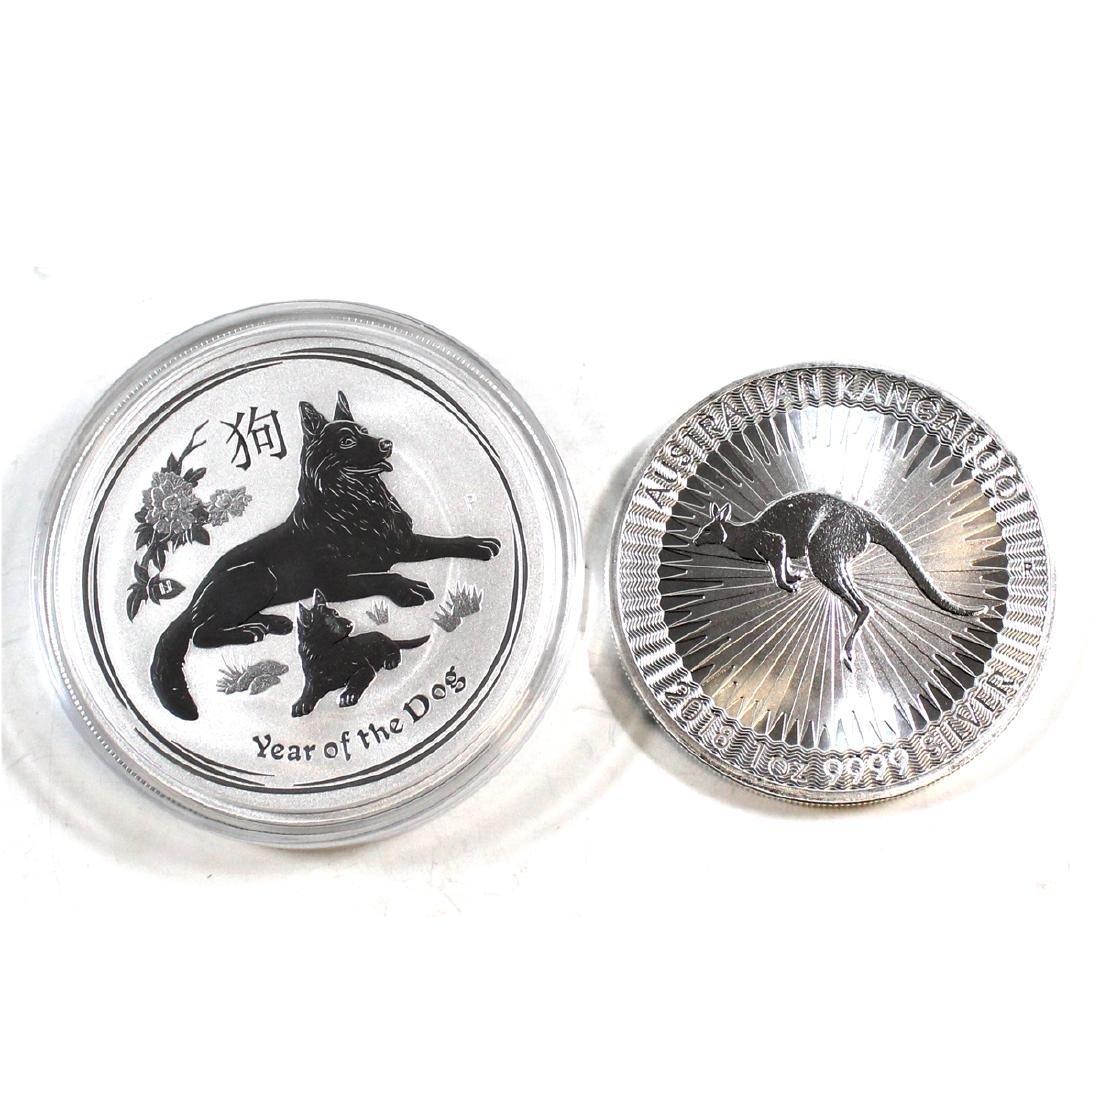 Pair of 2018 Australia $1 1oz. .999 Fine Silver Coins -